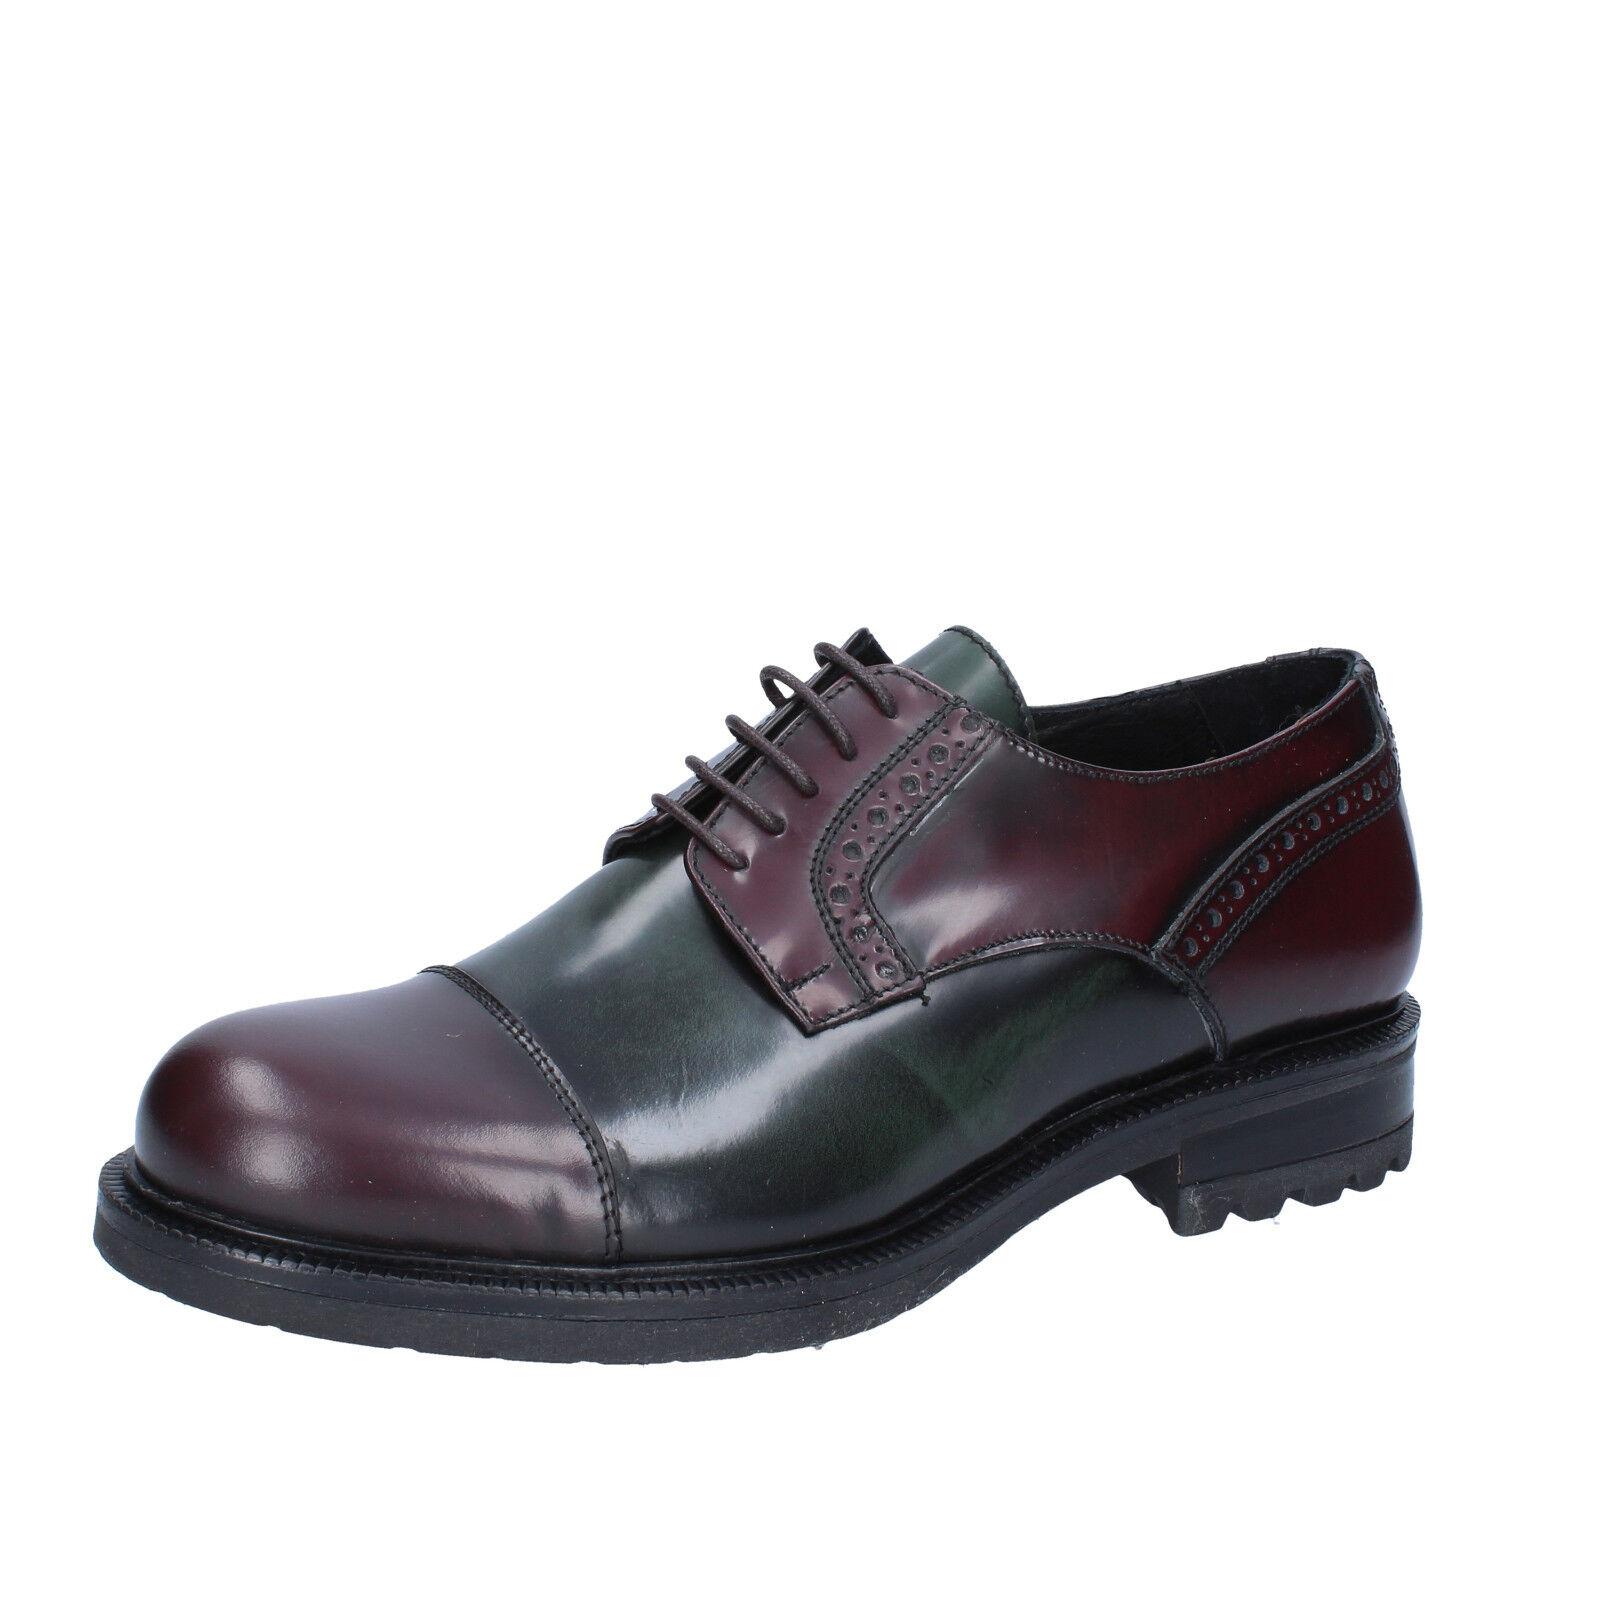 Mens shoes SALVO BARONE 10 (EU 44) elegant burgundy green shiny leather BZ186-F